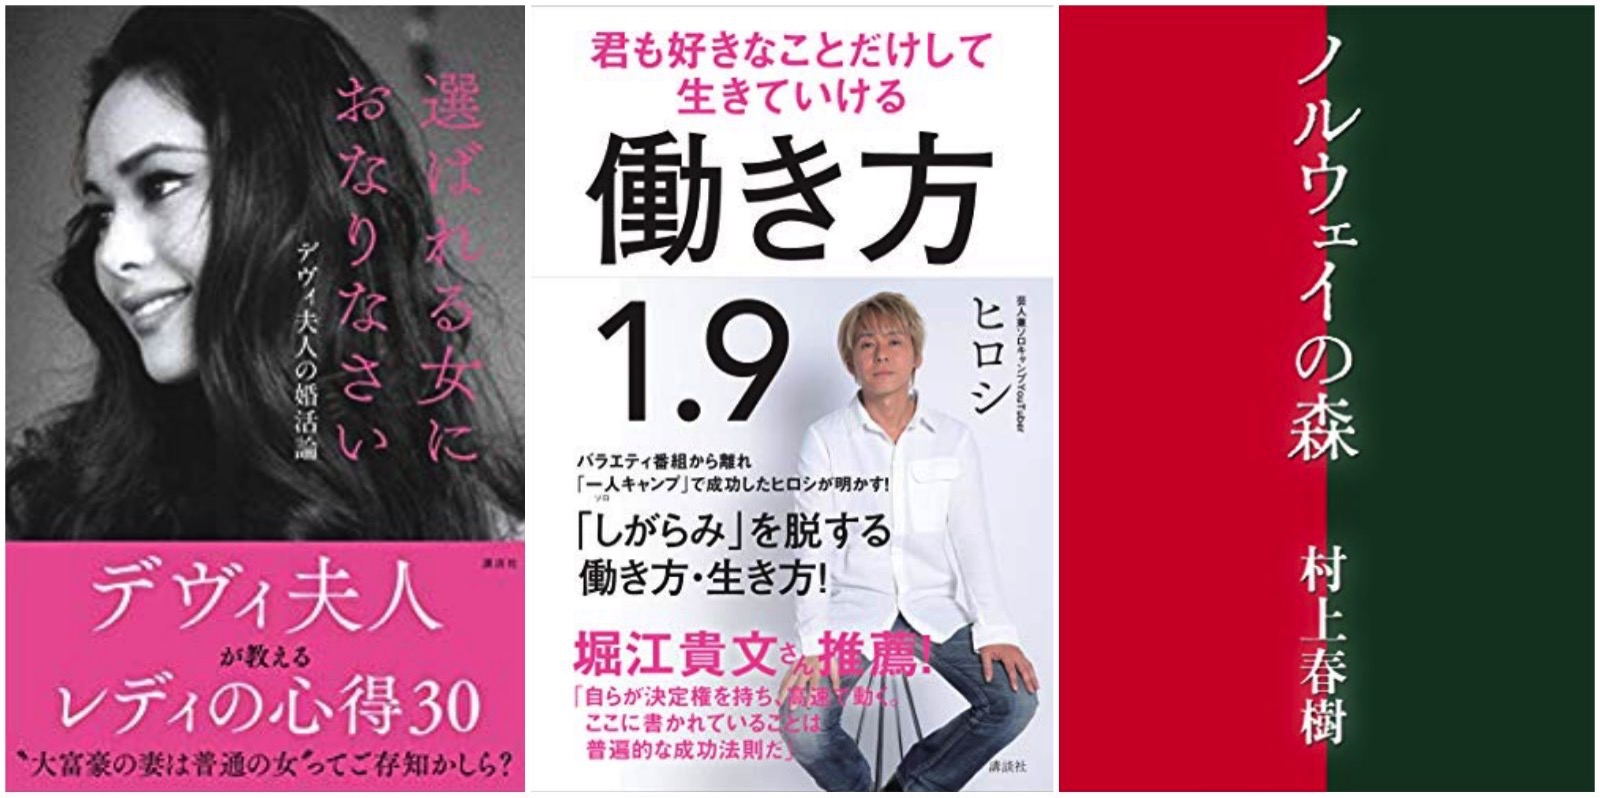 Kodansha Campaign